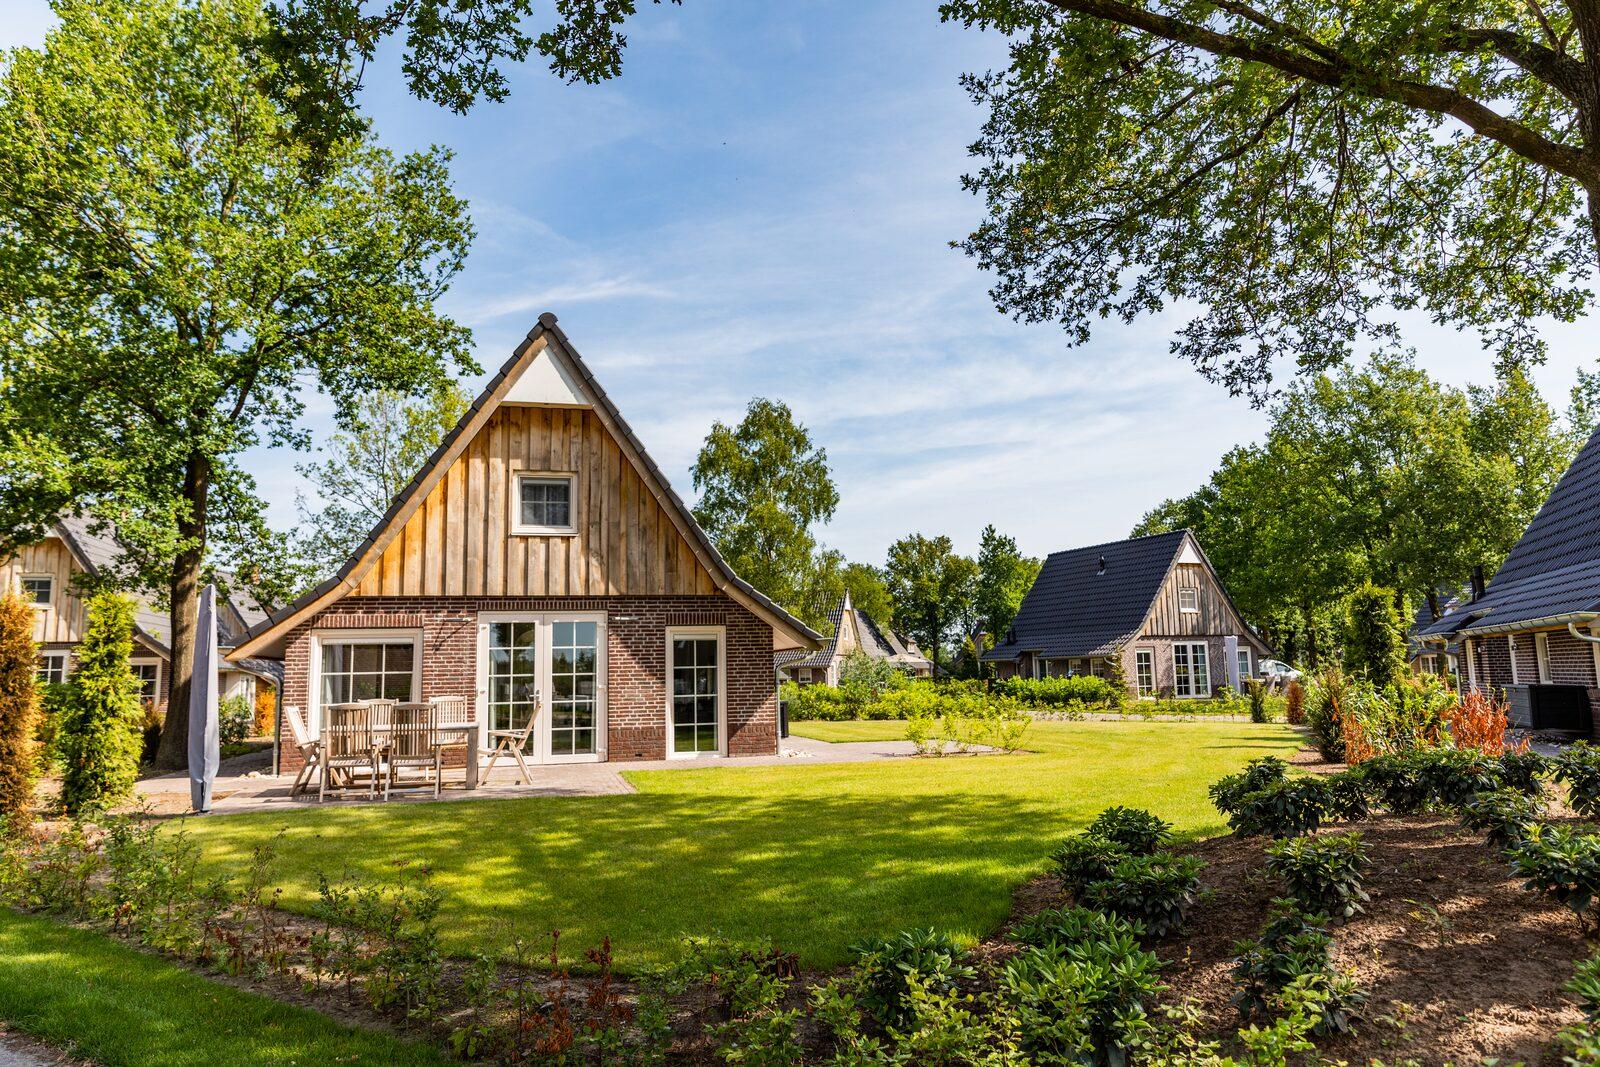 Luxus Ferienhaus in Holland